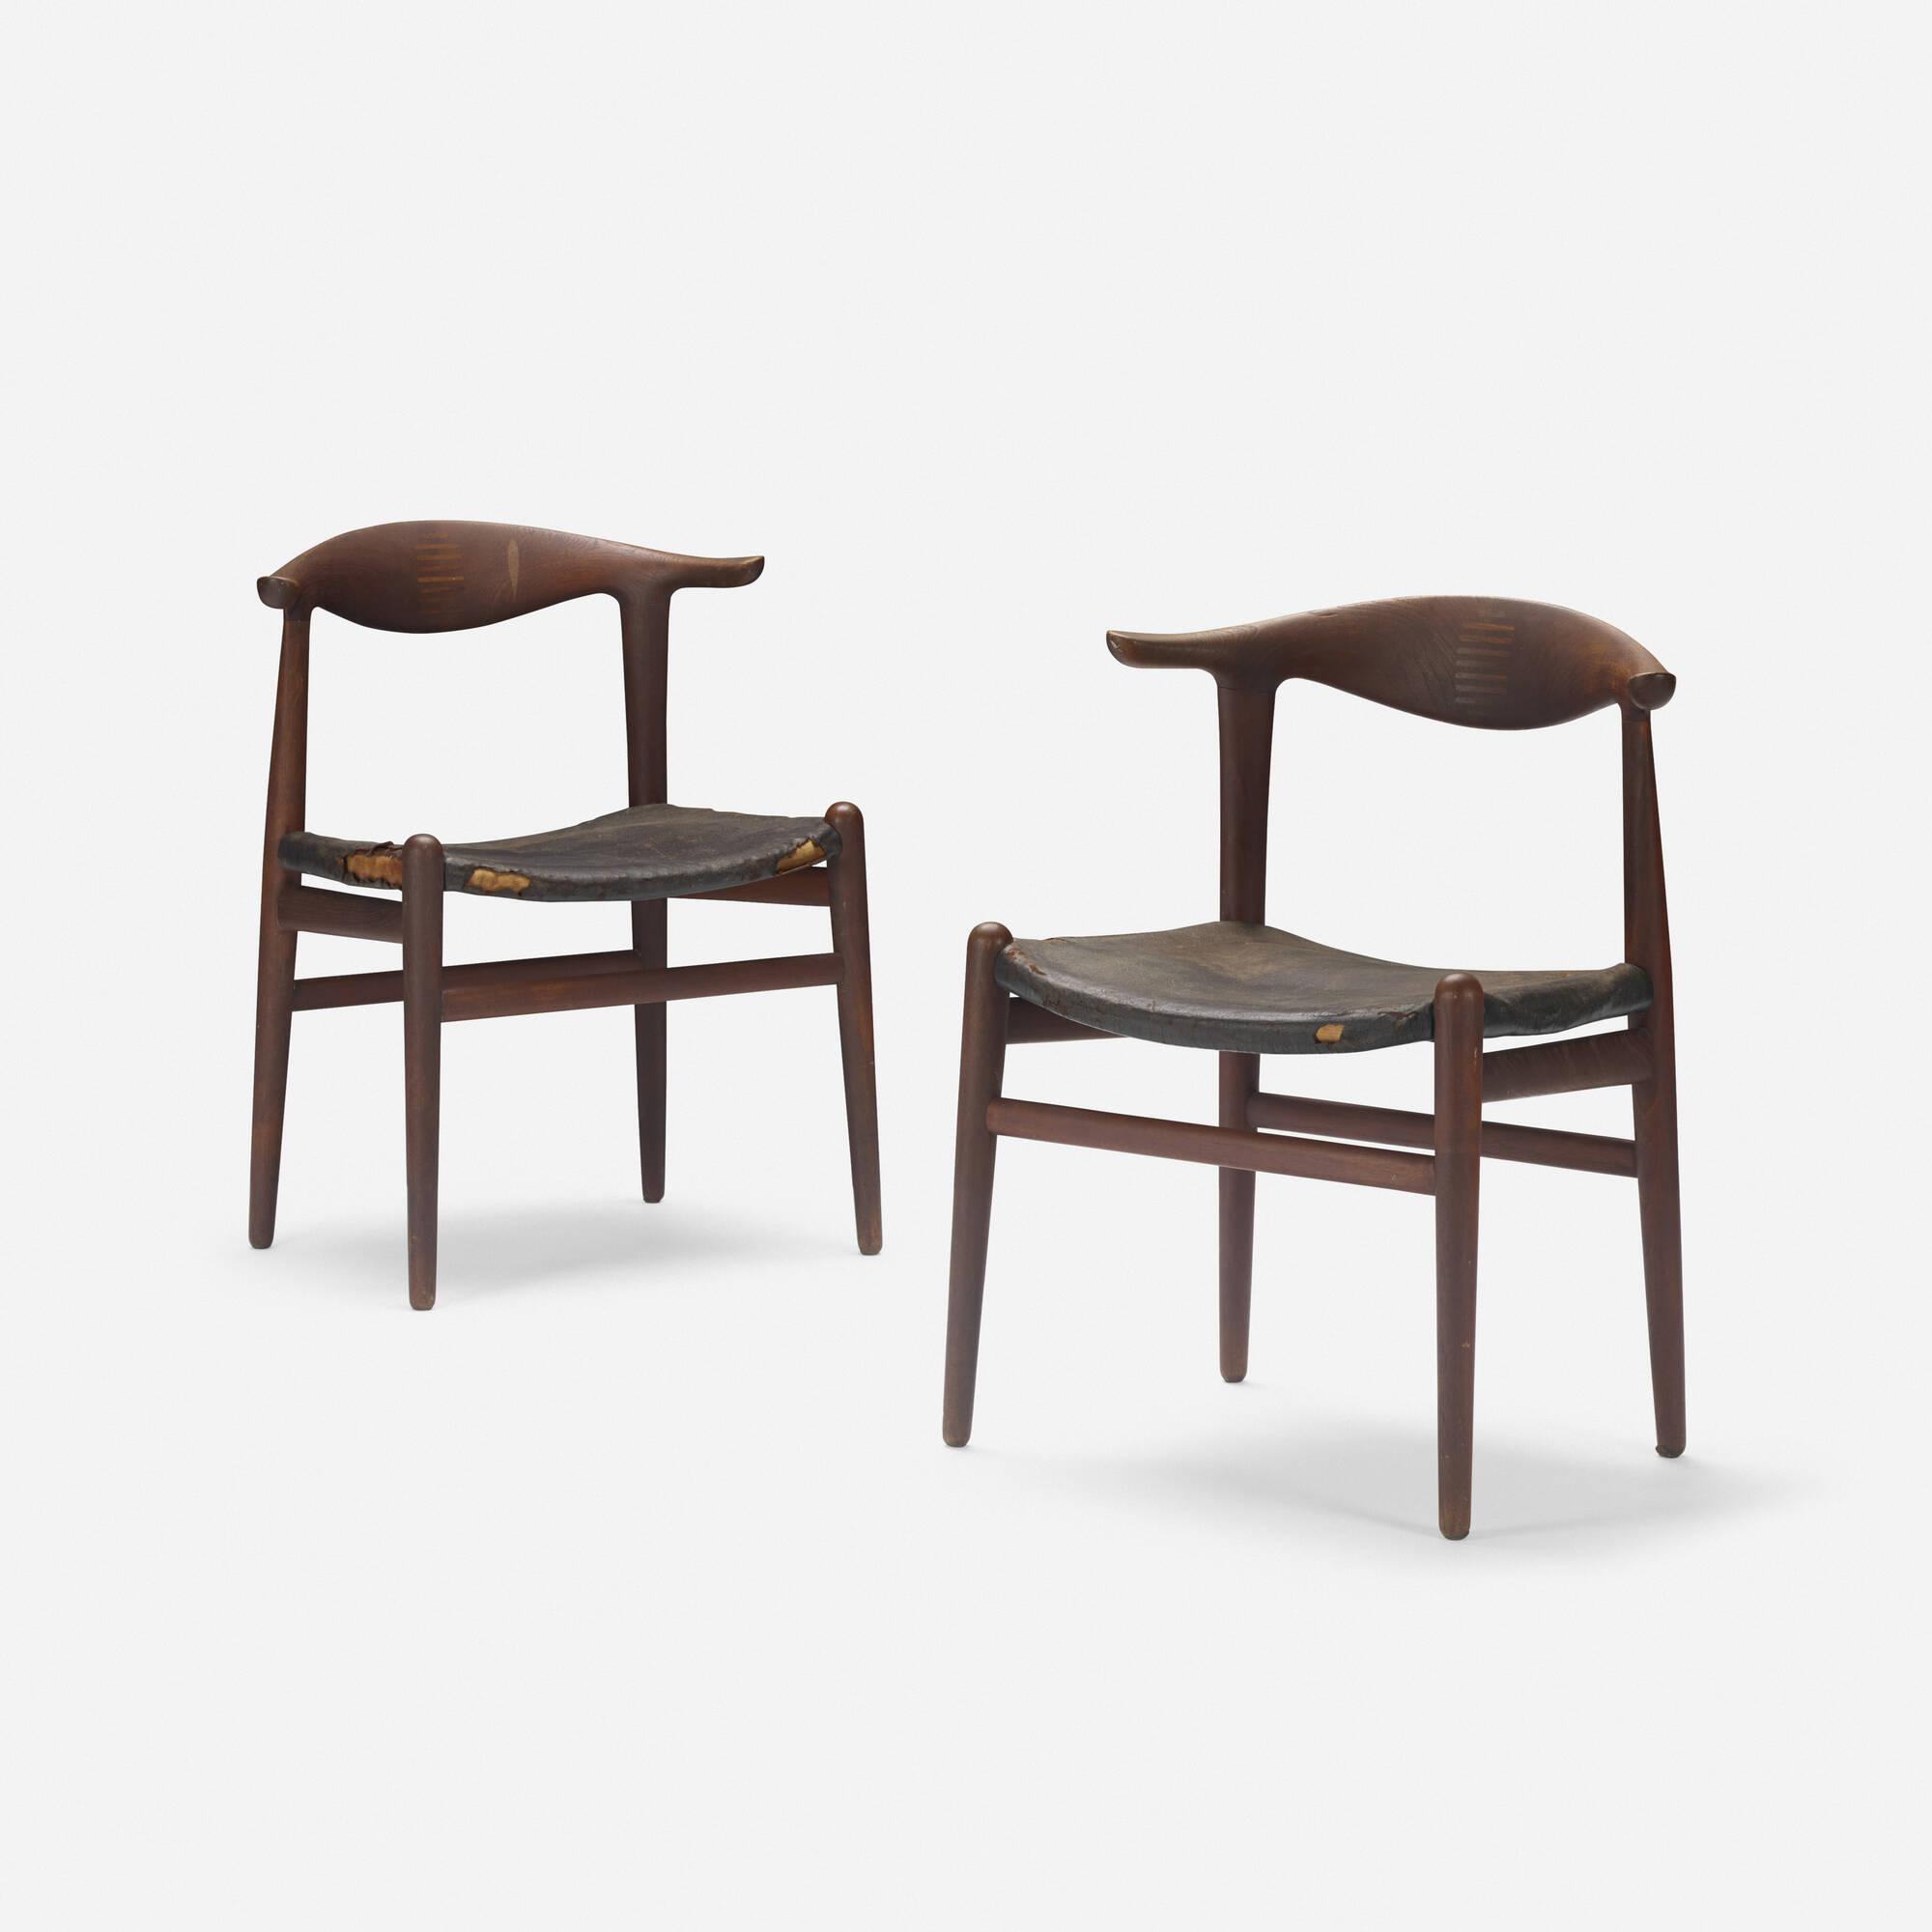 128: Hans J. Wegner / Cow Horn chairs, pair (1 of 3)